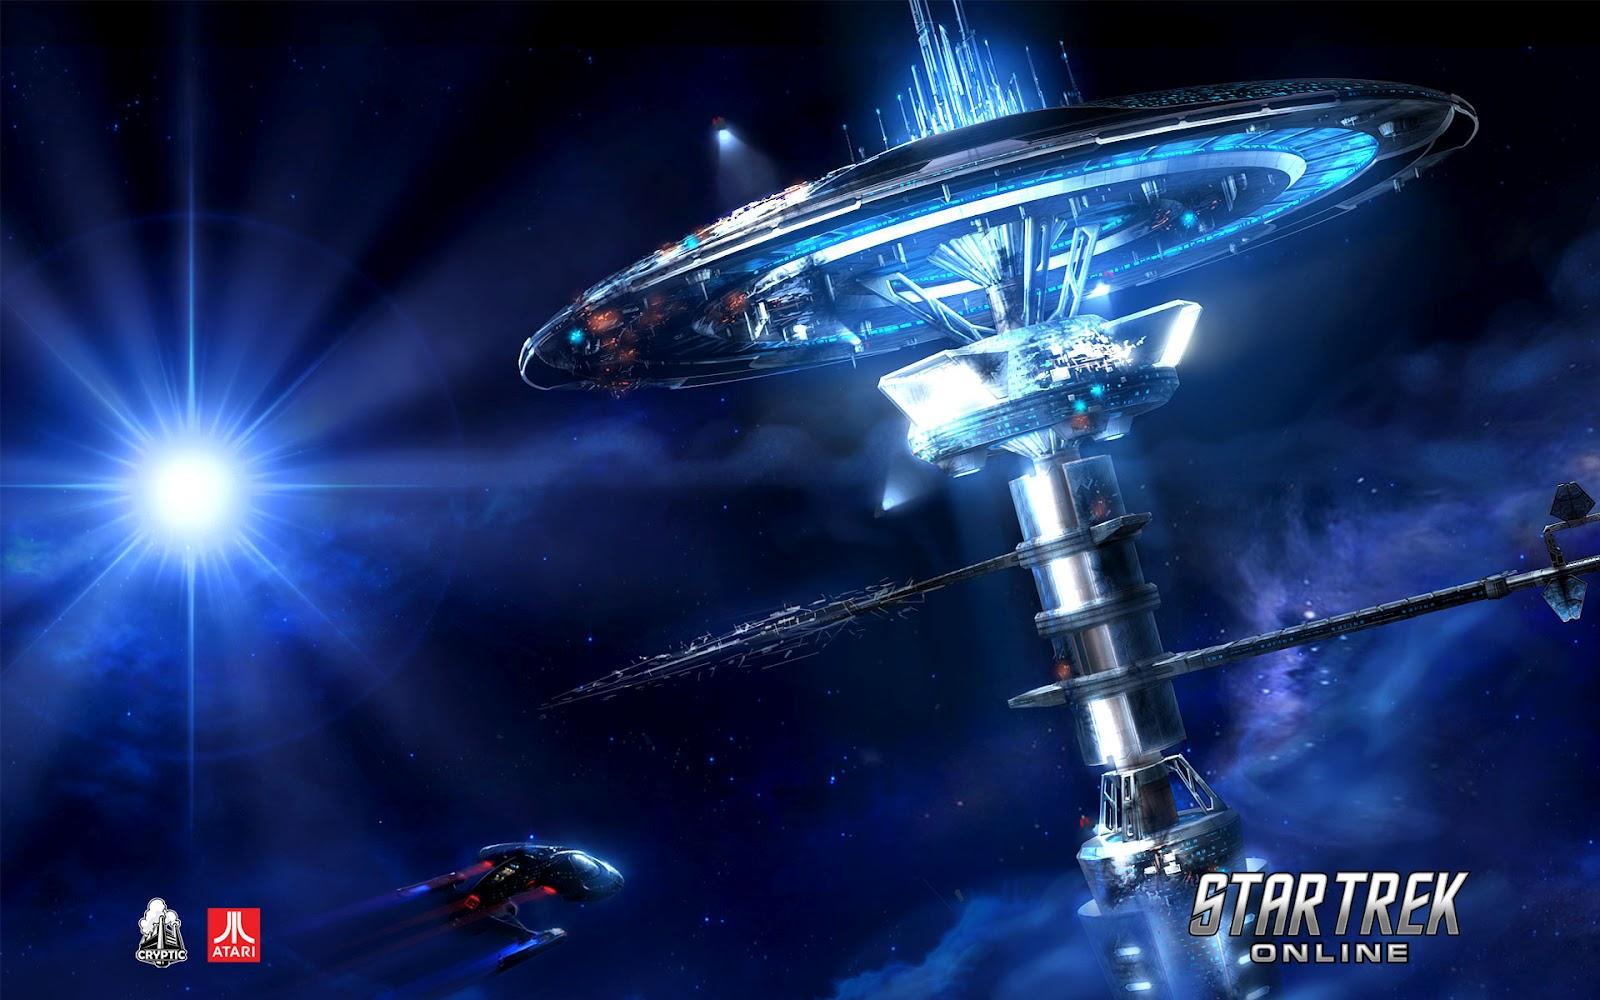 Wallpaper HD Star Trek online 1600x1000